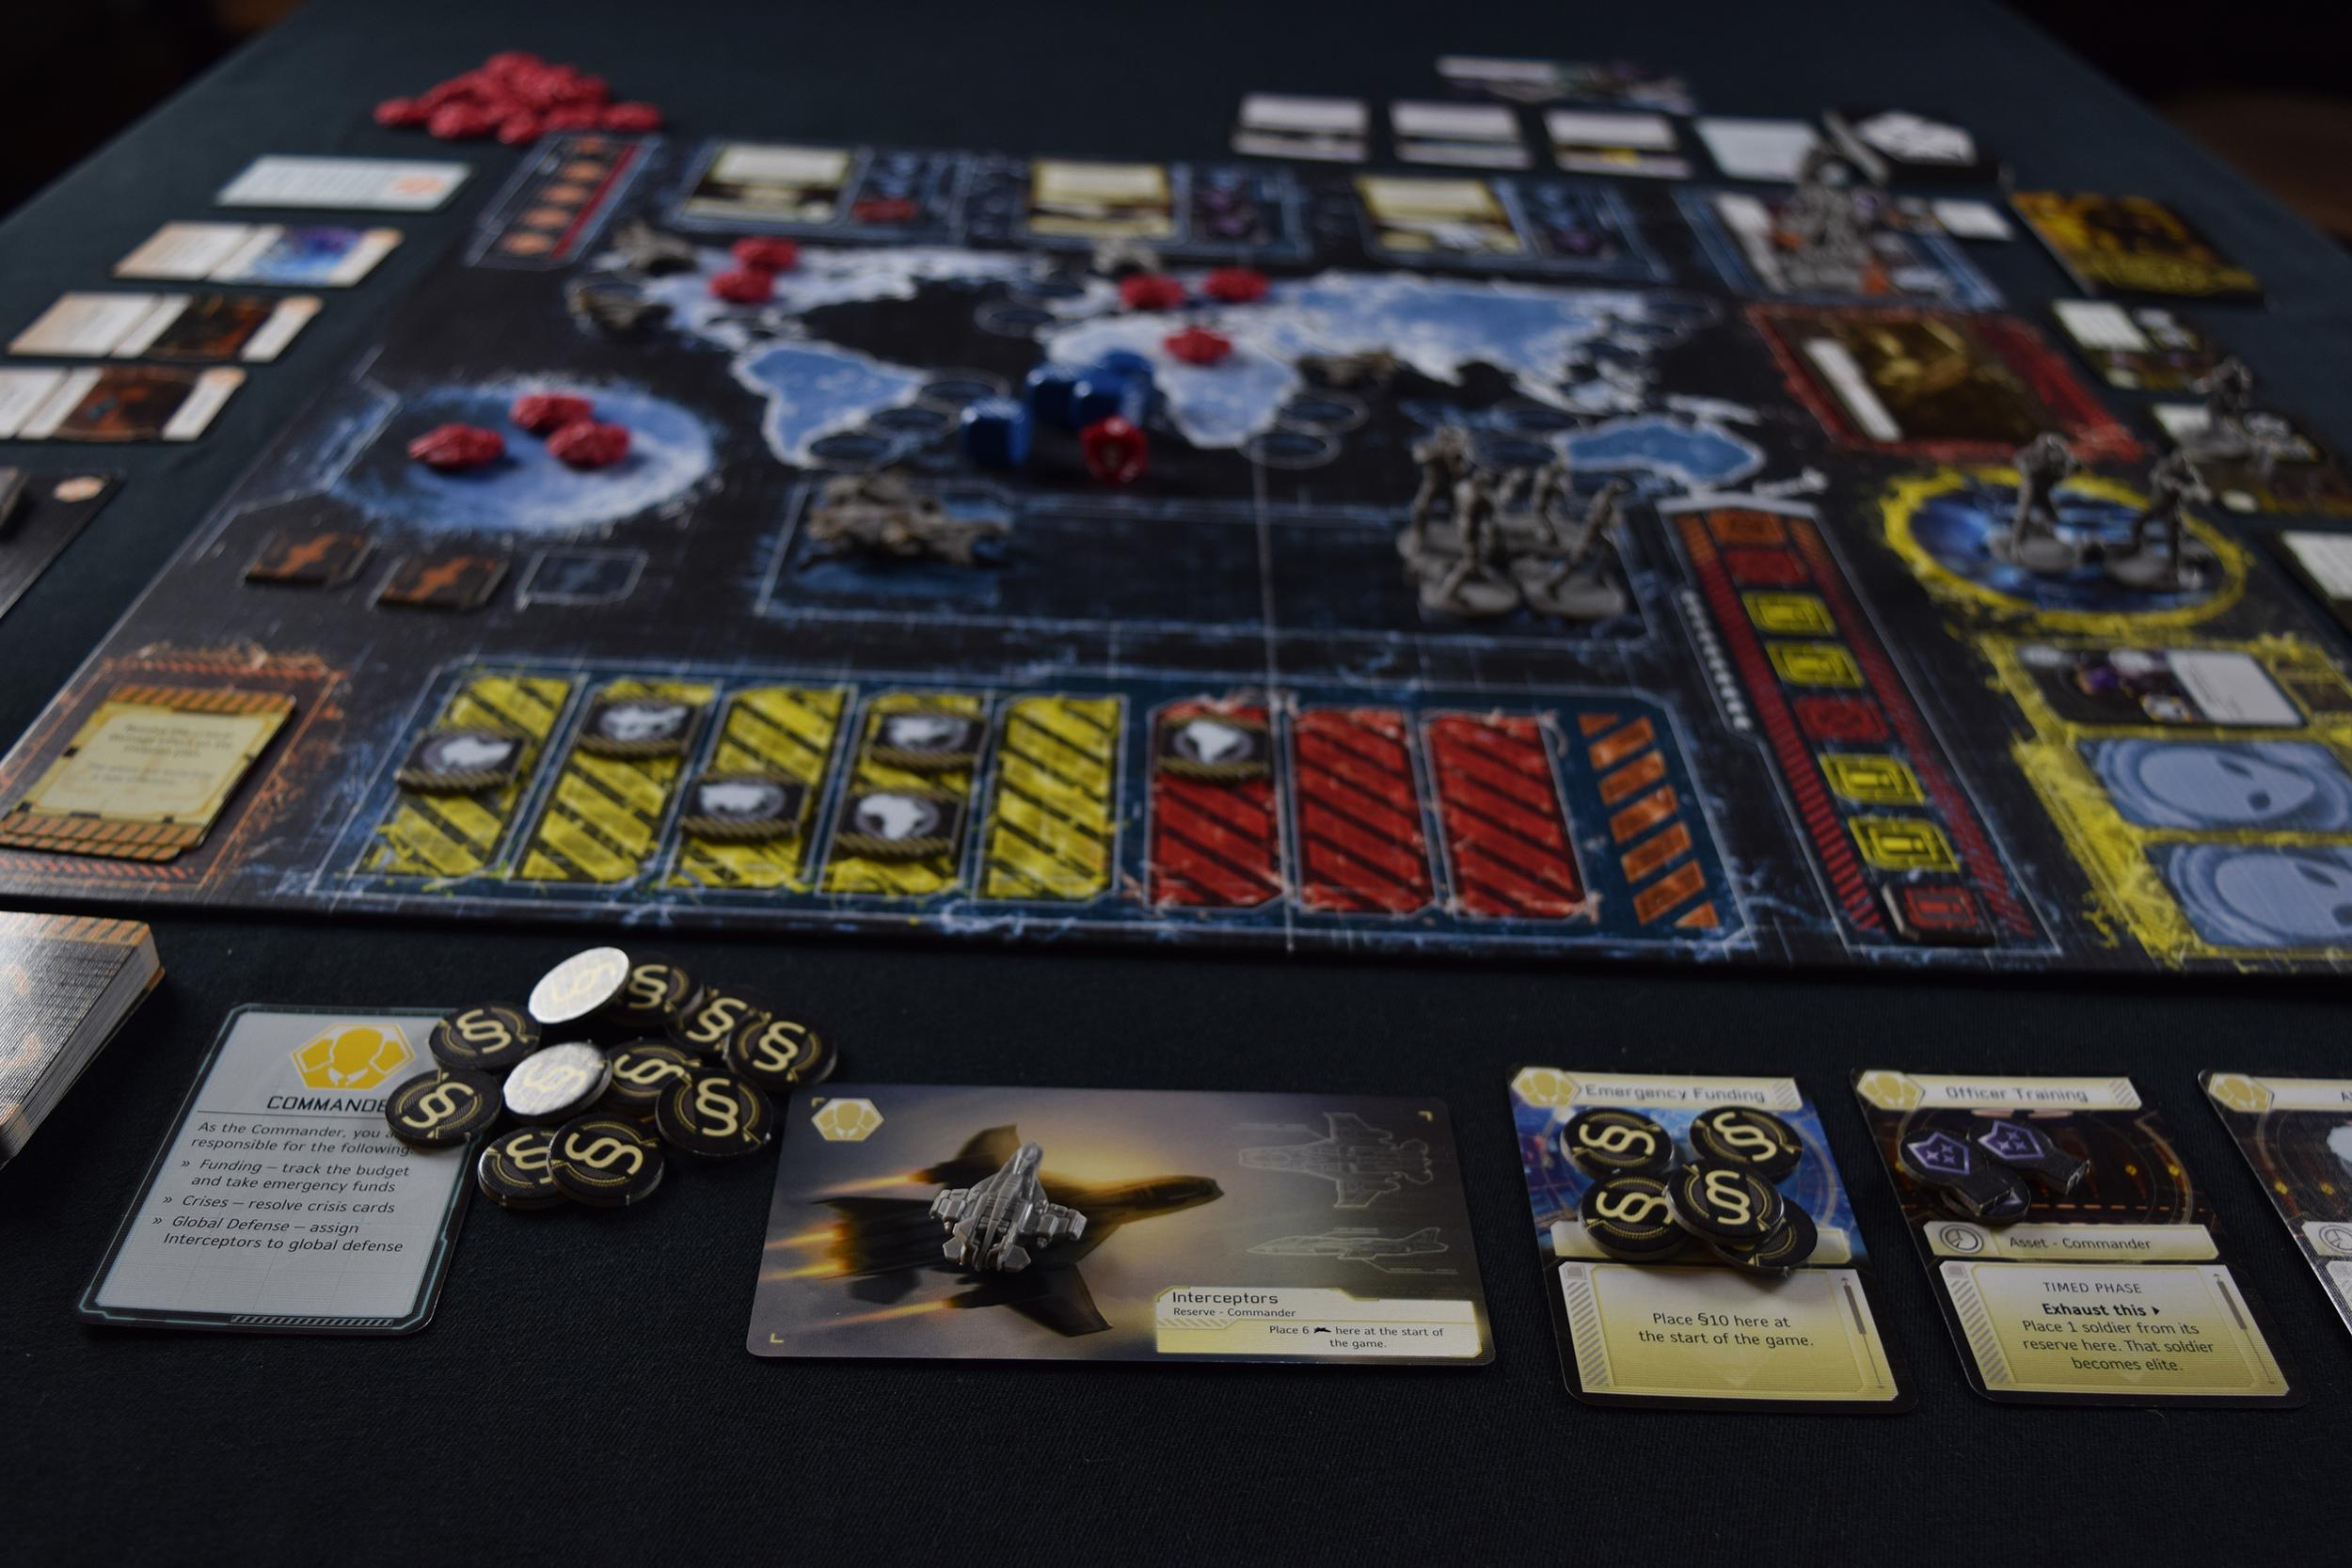 XCOM The Board Game's board.